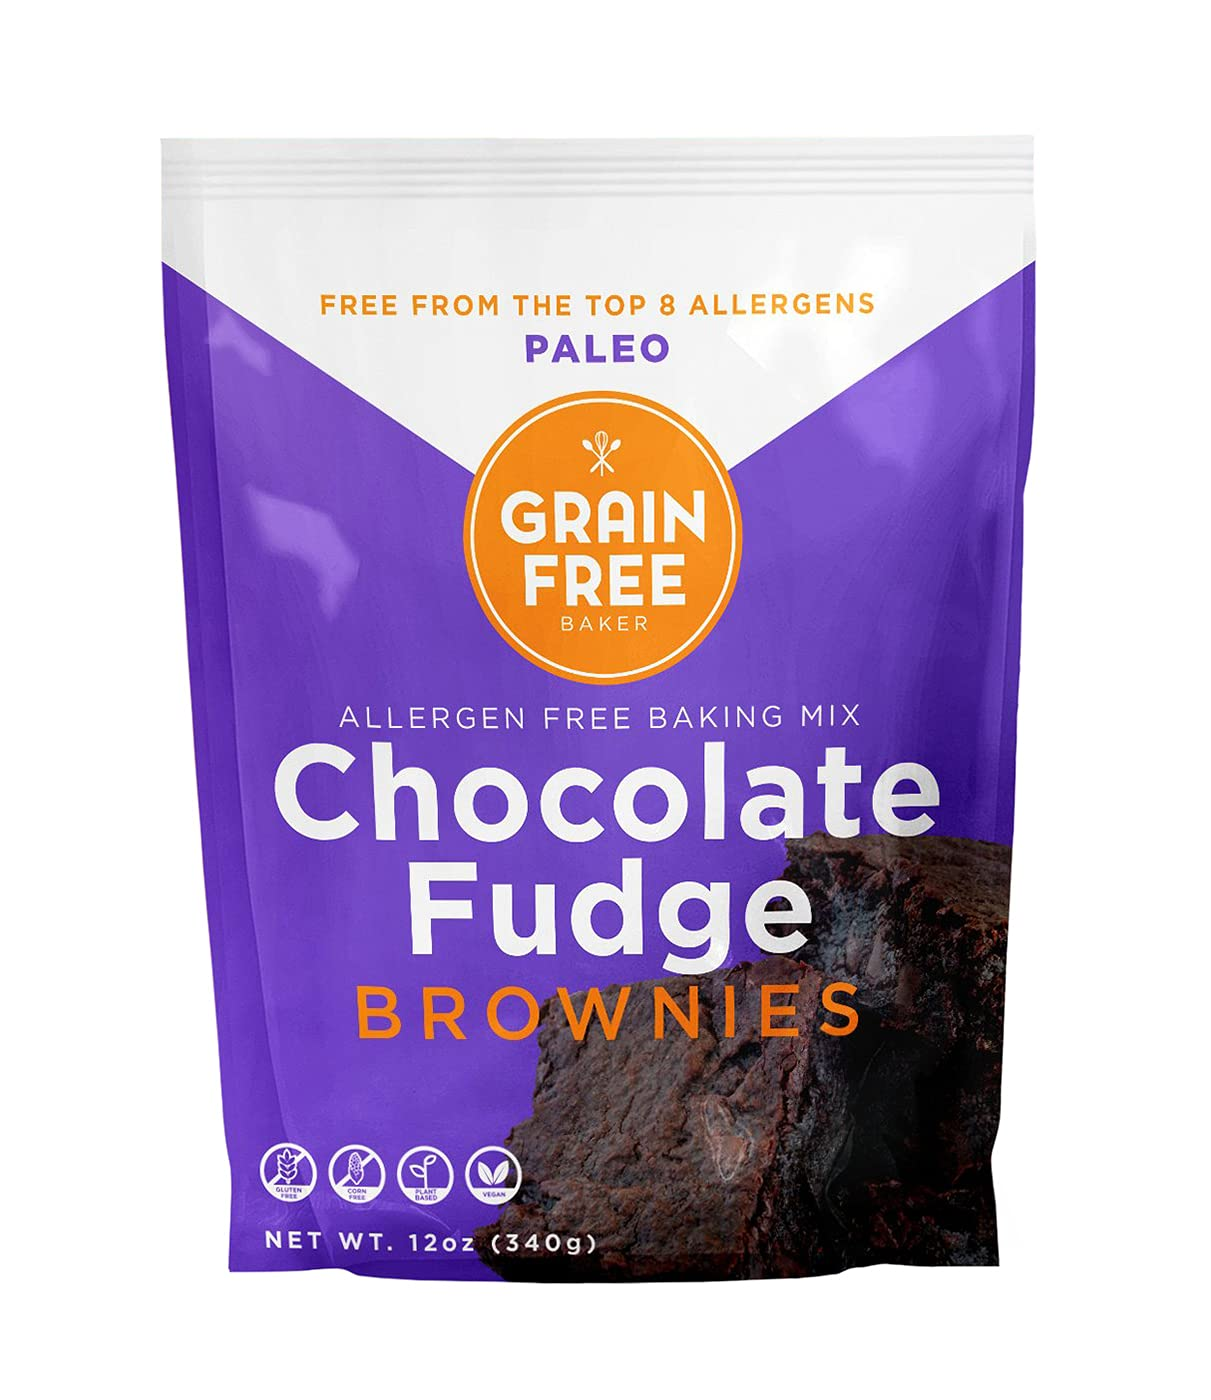 Gluten Ranking TOP19 Free Paleo Fudge Brownie Baking Purchase by Mix Grain The Bak